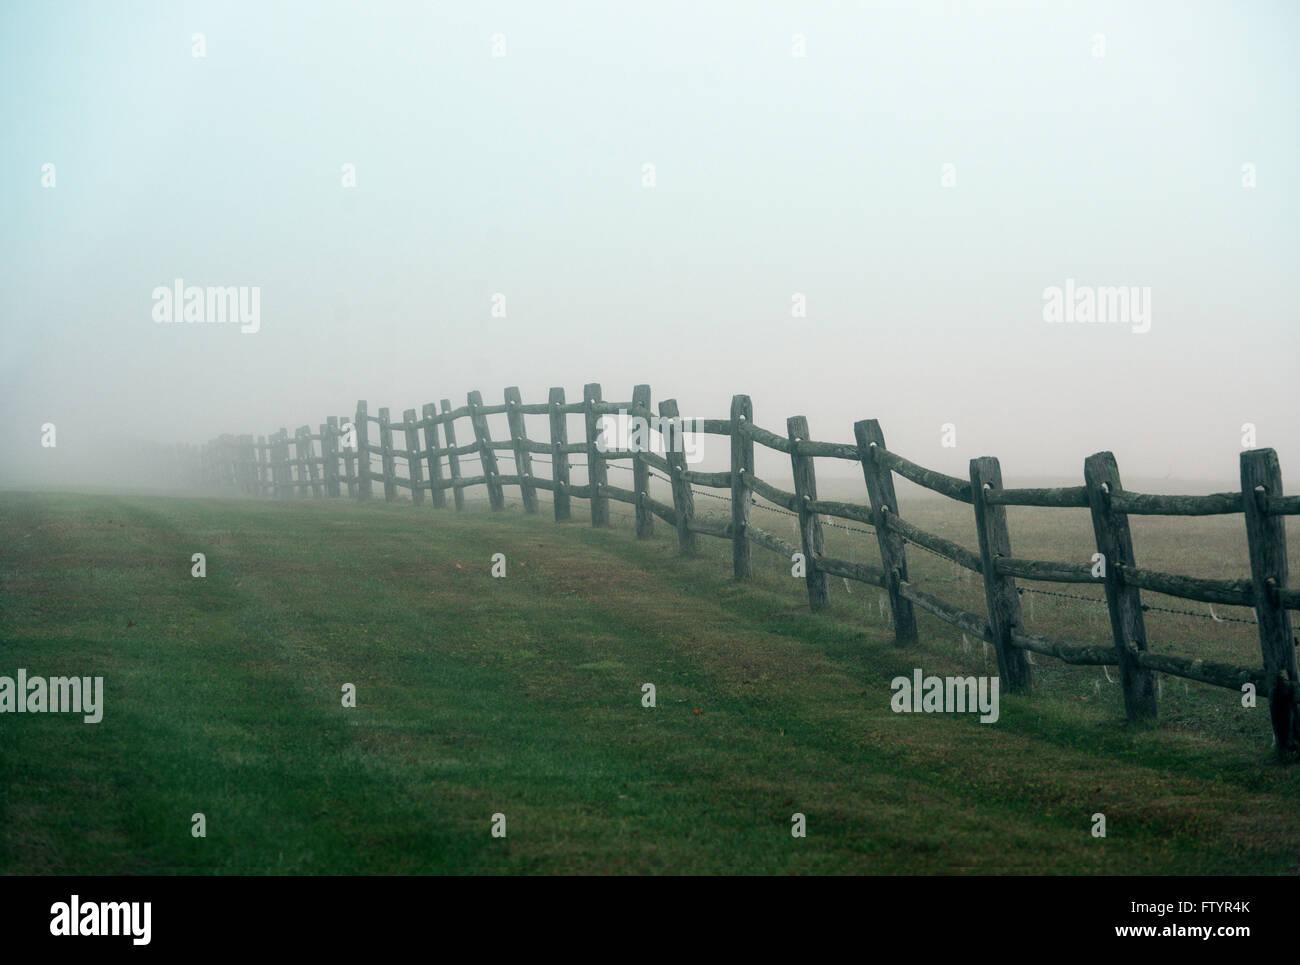 Wooden Farm Fence wooden farm fence on a foggy morning, connecticut, usa stock photo